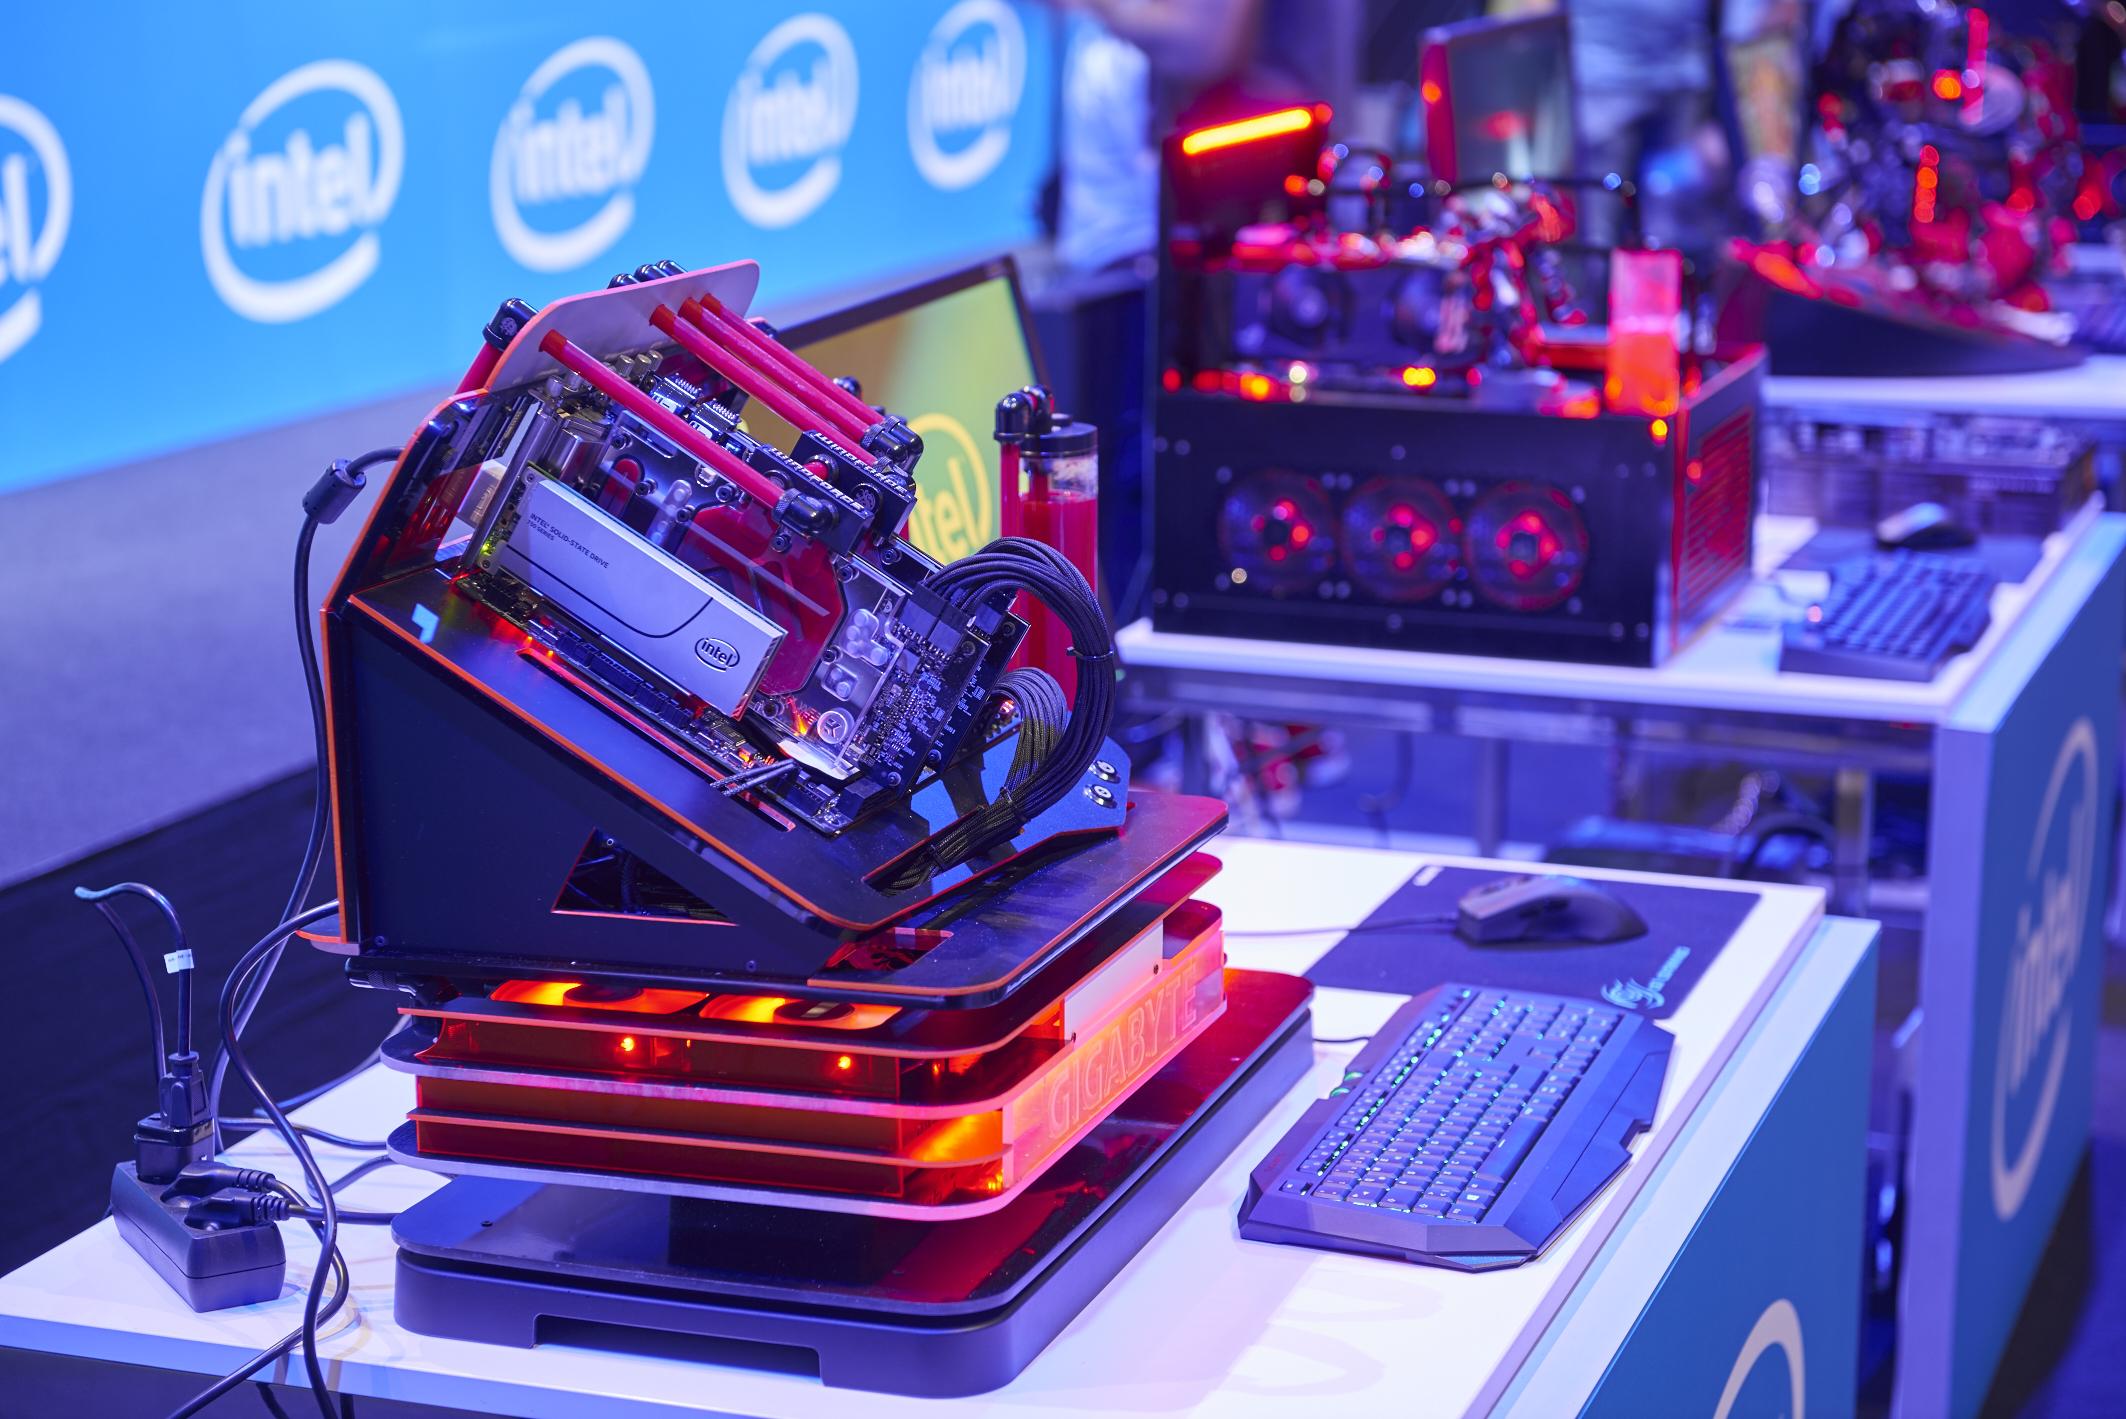 Intel Gamescom 2015_JPEG_18x12cm_PK_01